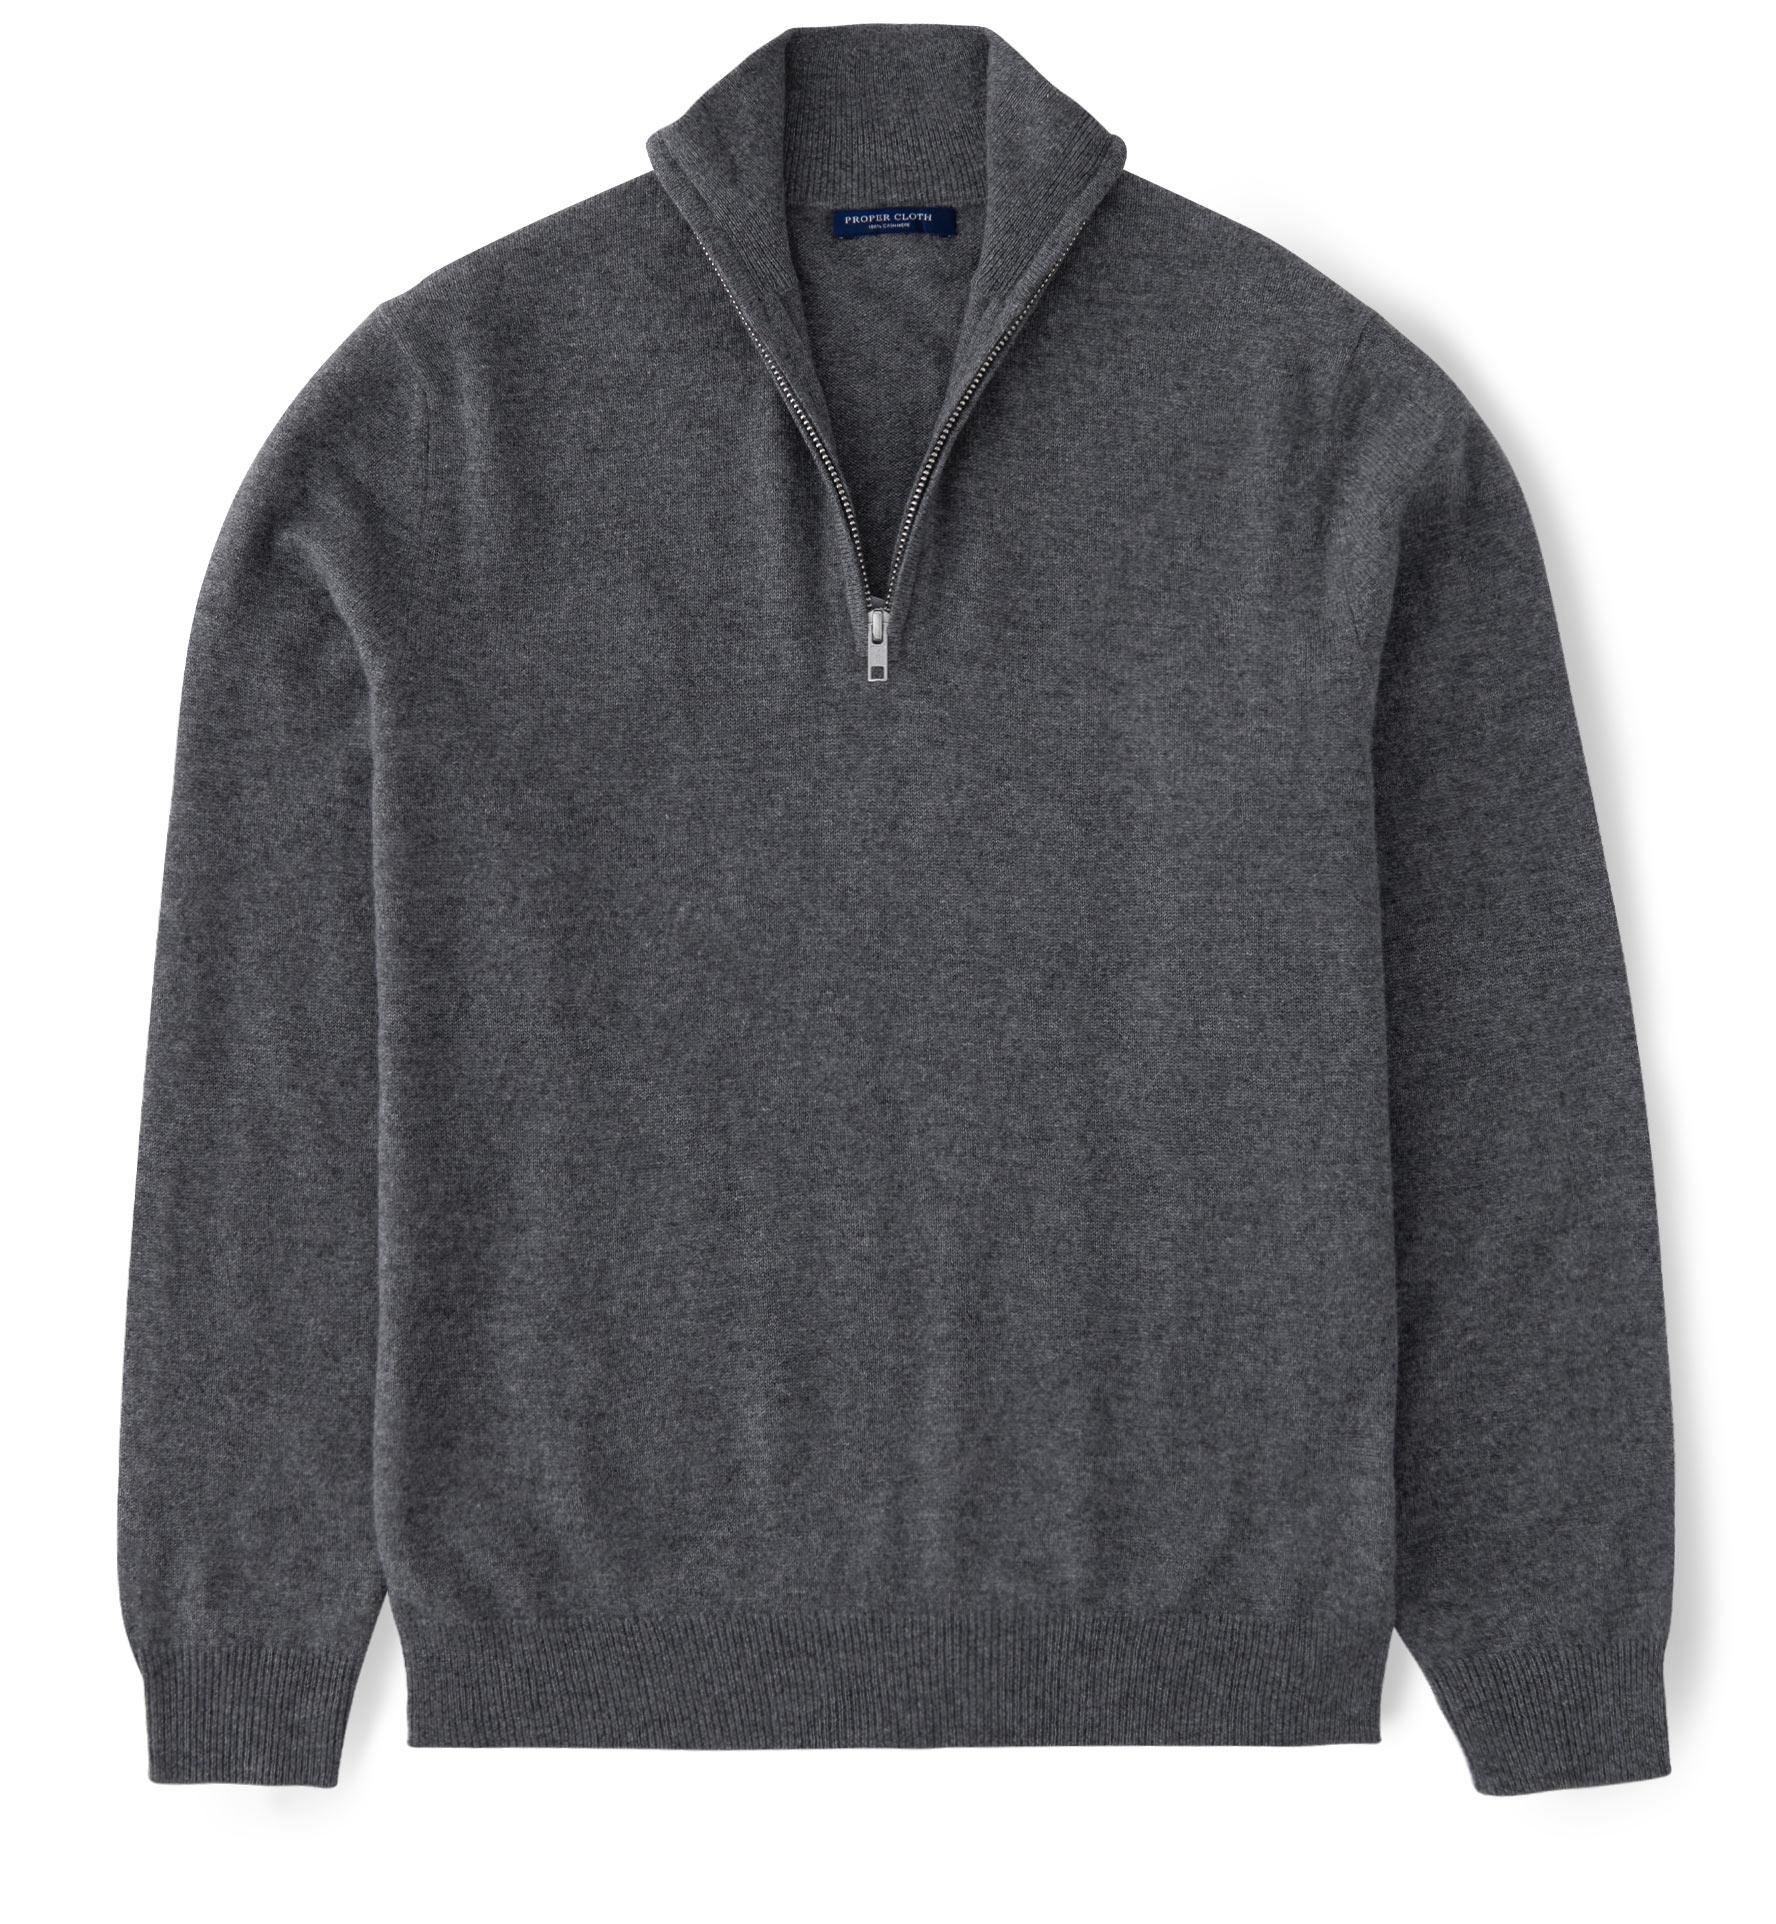 Half Zip Cashemere Sweater in 4 Colors